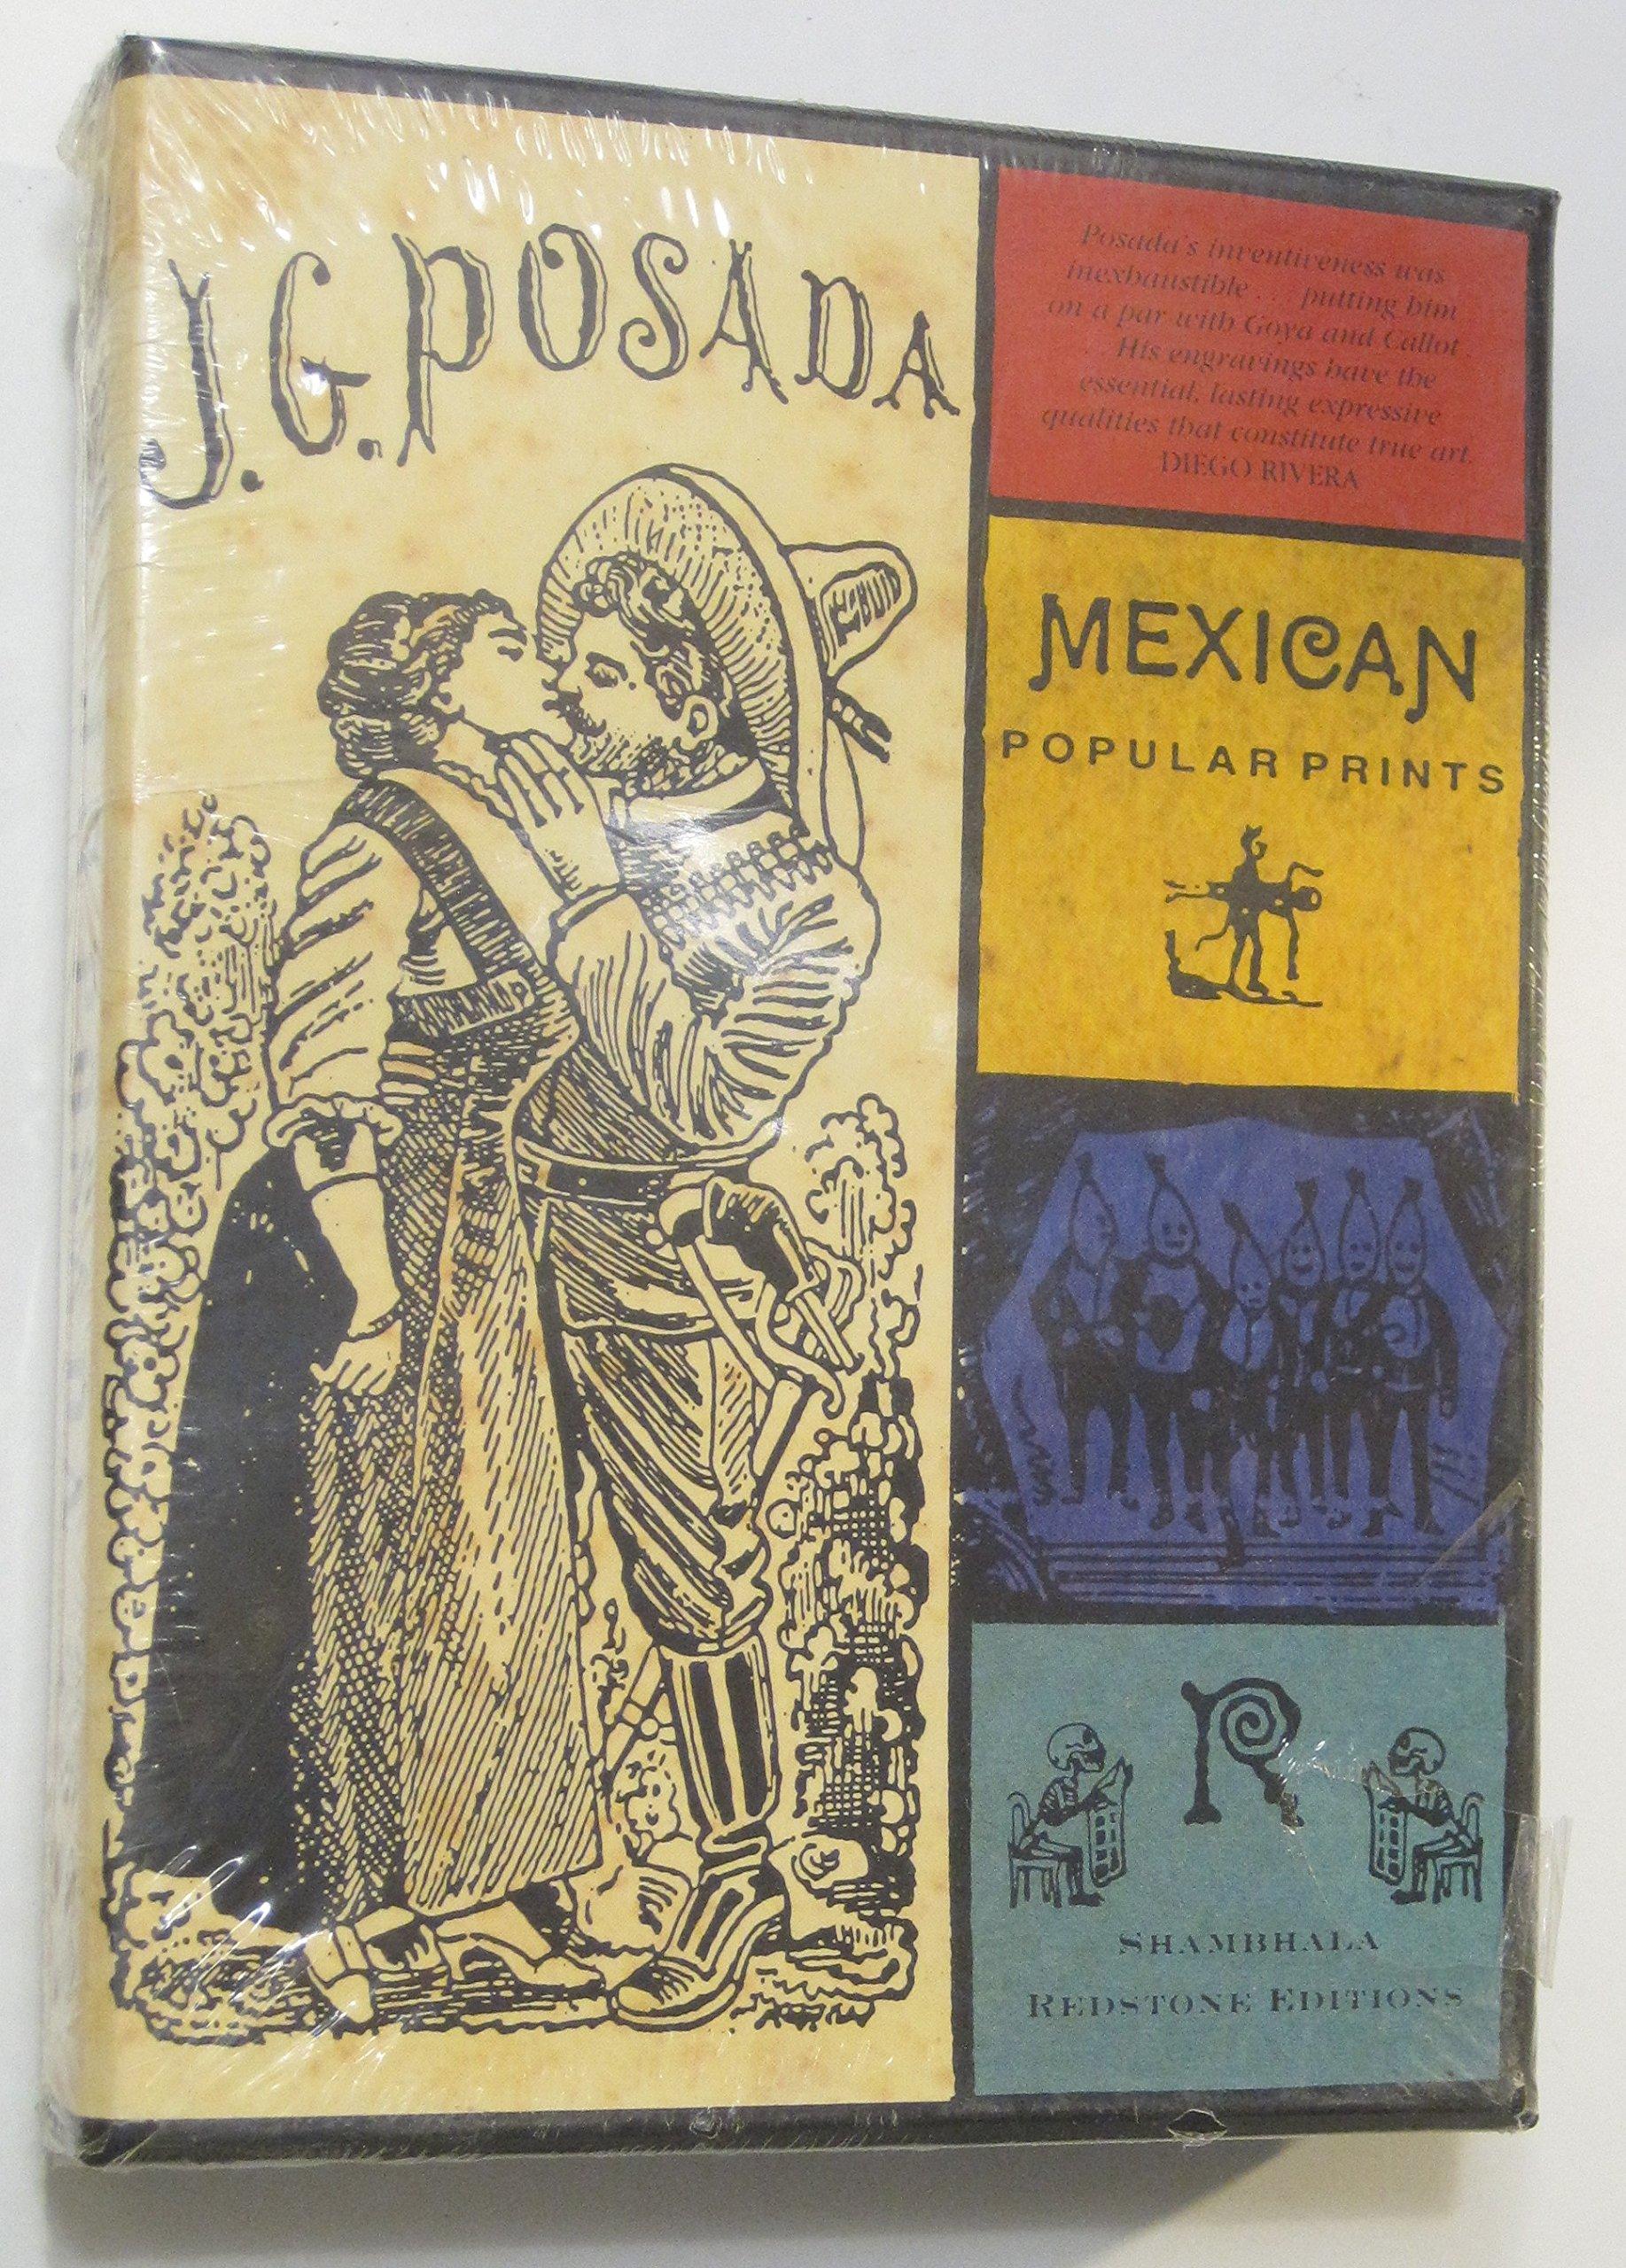 J.G. POSADA: Popular Mexican Prints (Shambhala Redstone Editions)